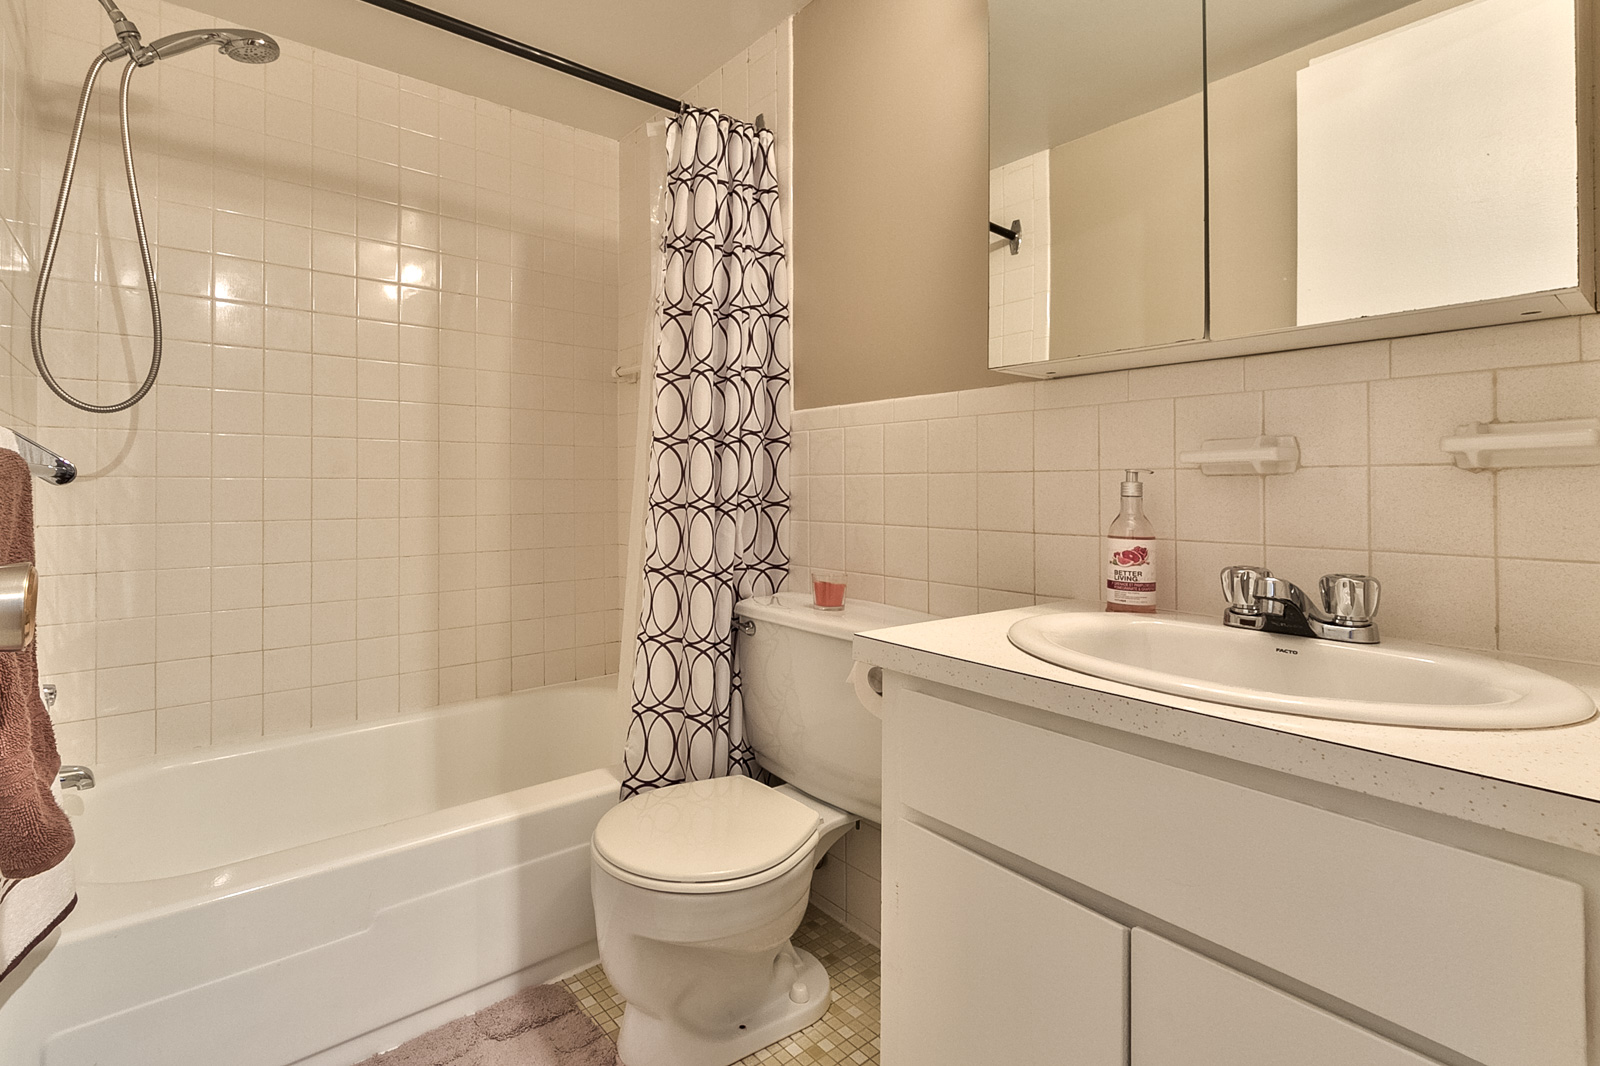 Salle de bain entreprises helio inc - Entreprise salle de bain ...